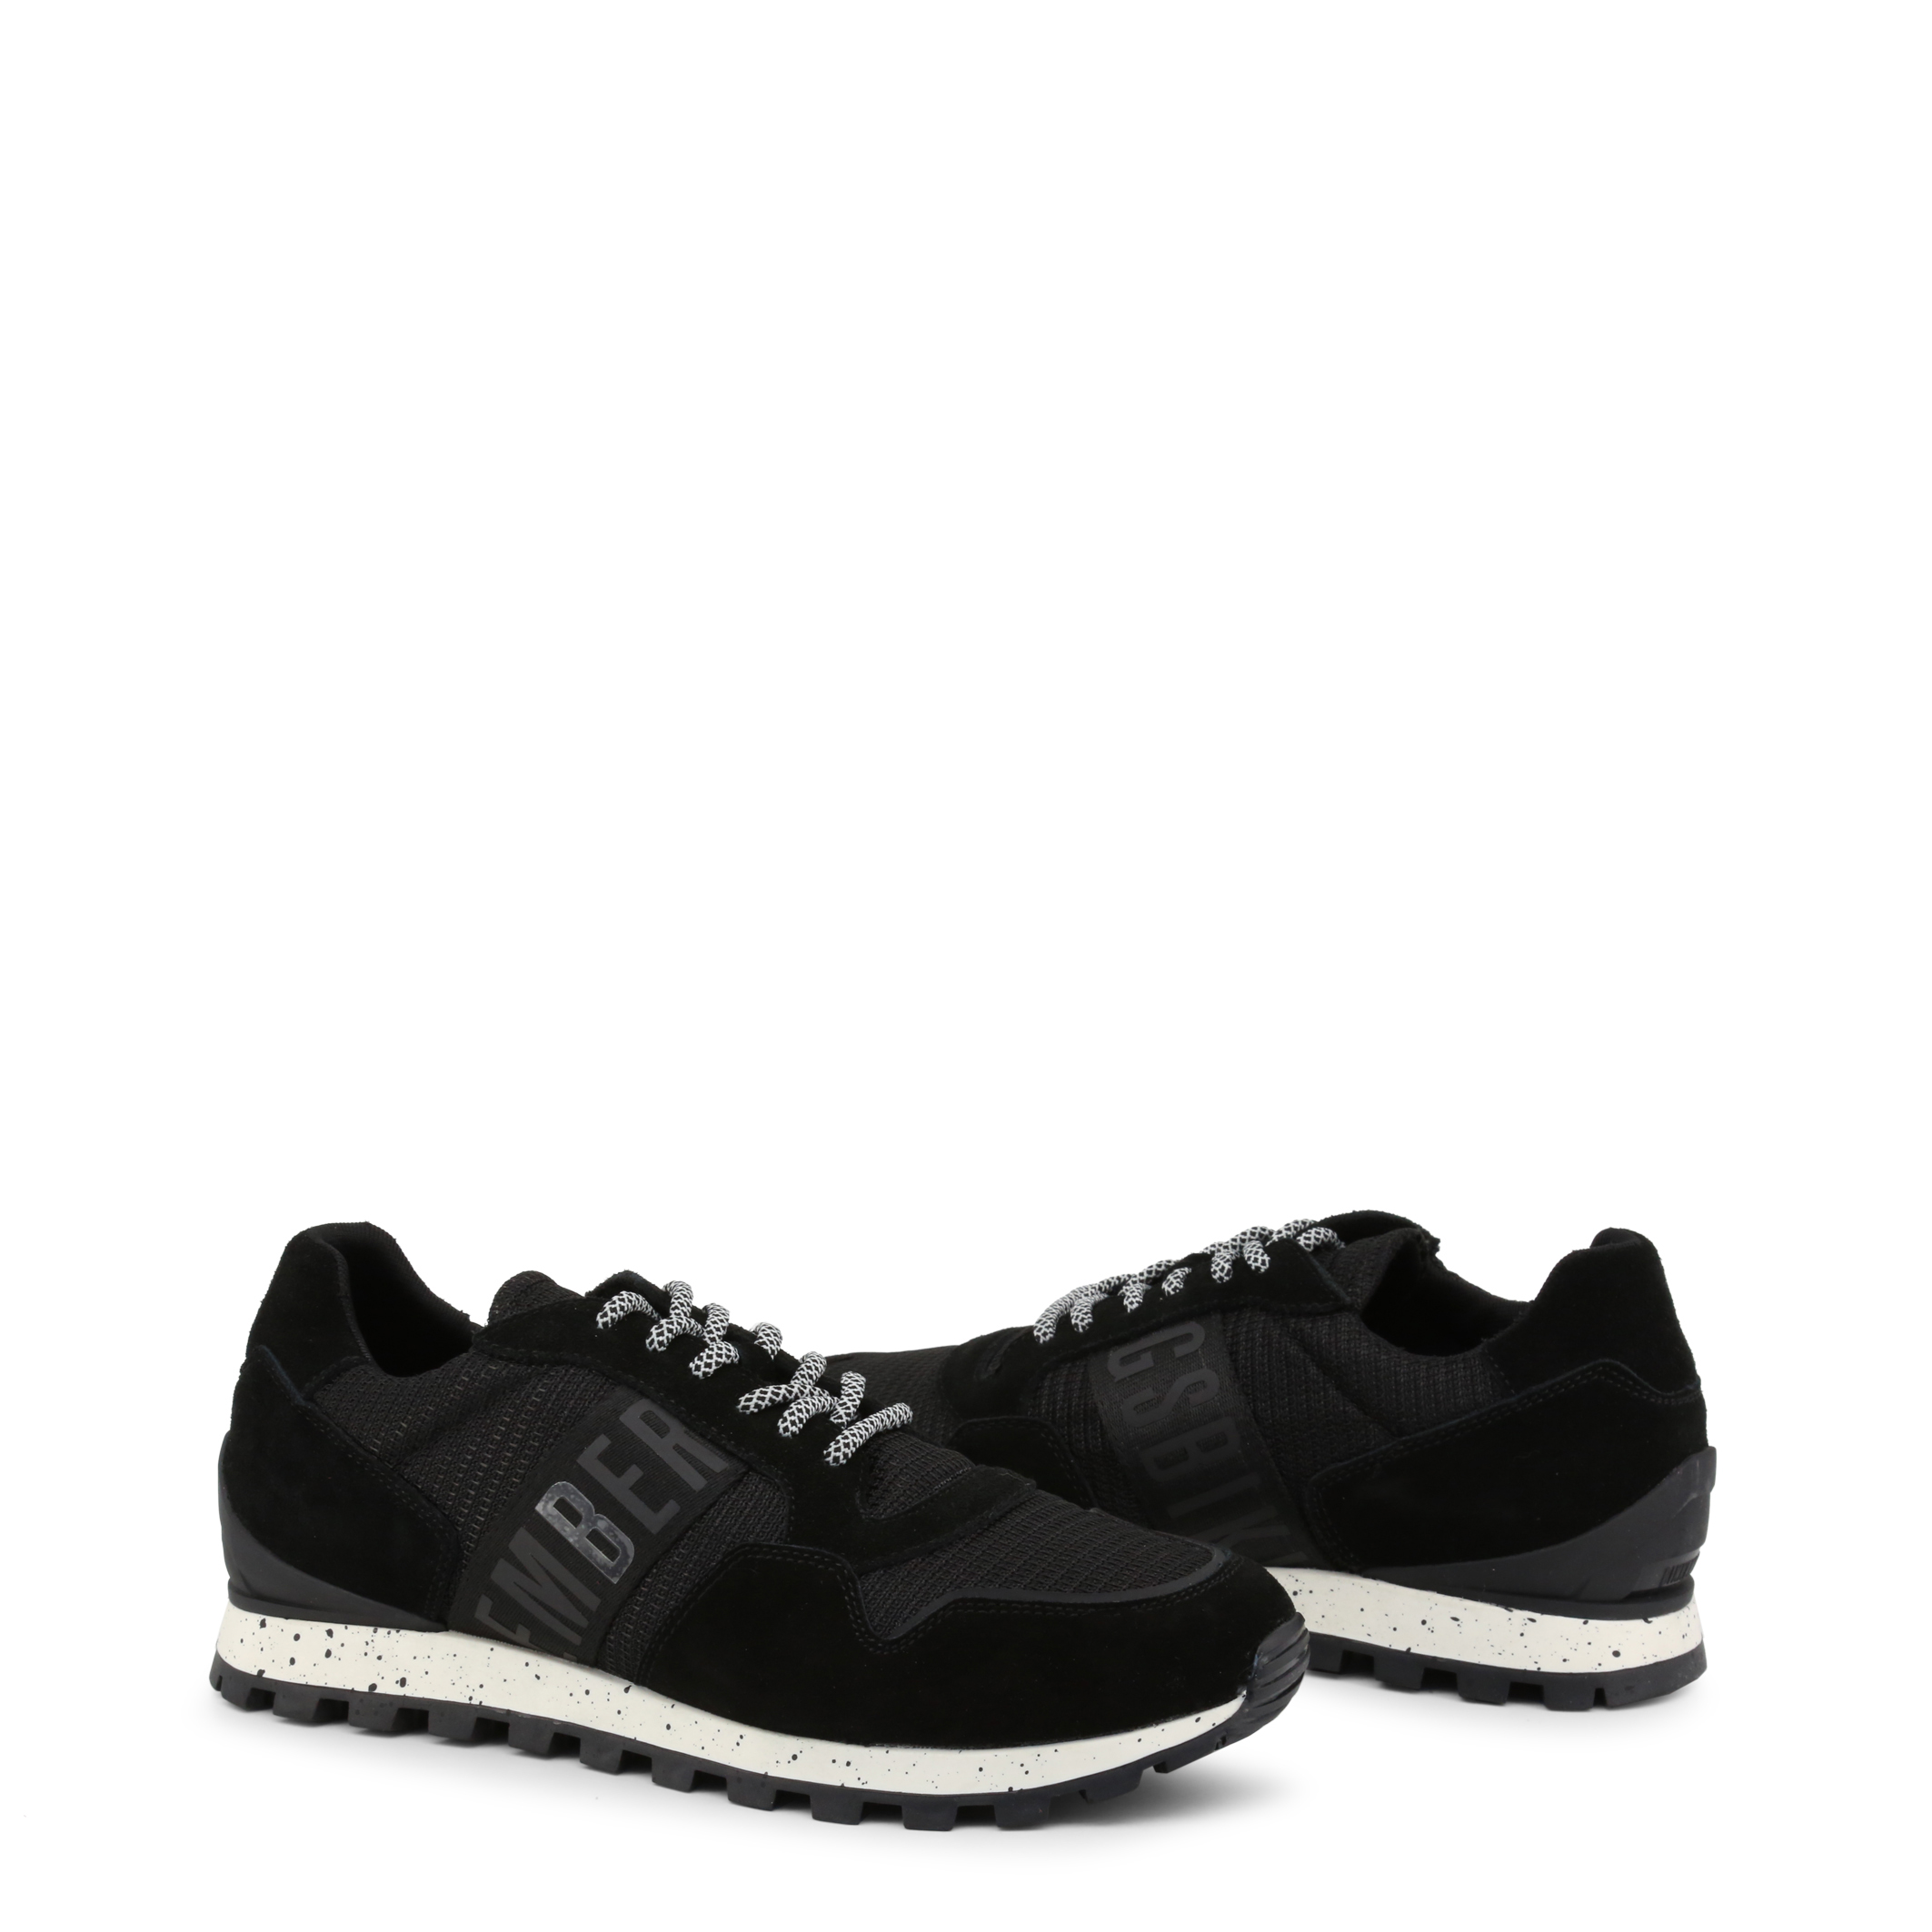 Sneakers-Bikkembergs-FEND-ER-2356-Uomo-Nero-101355 miniatura 2